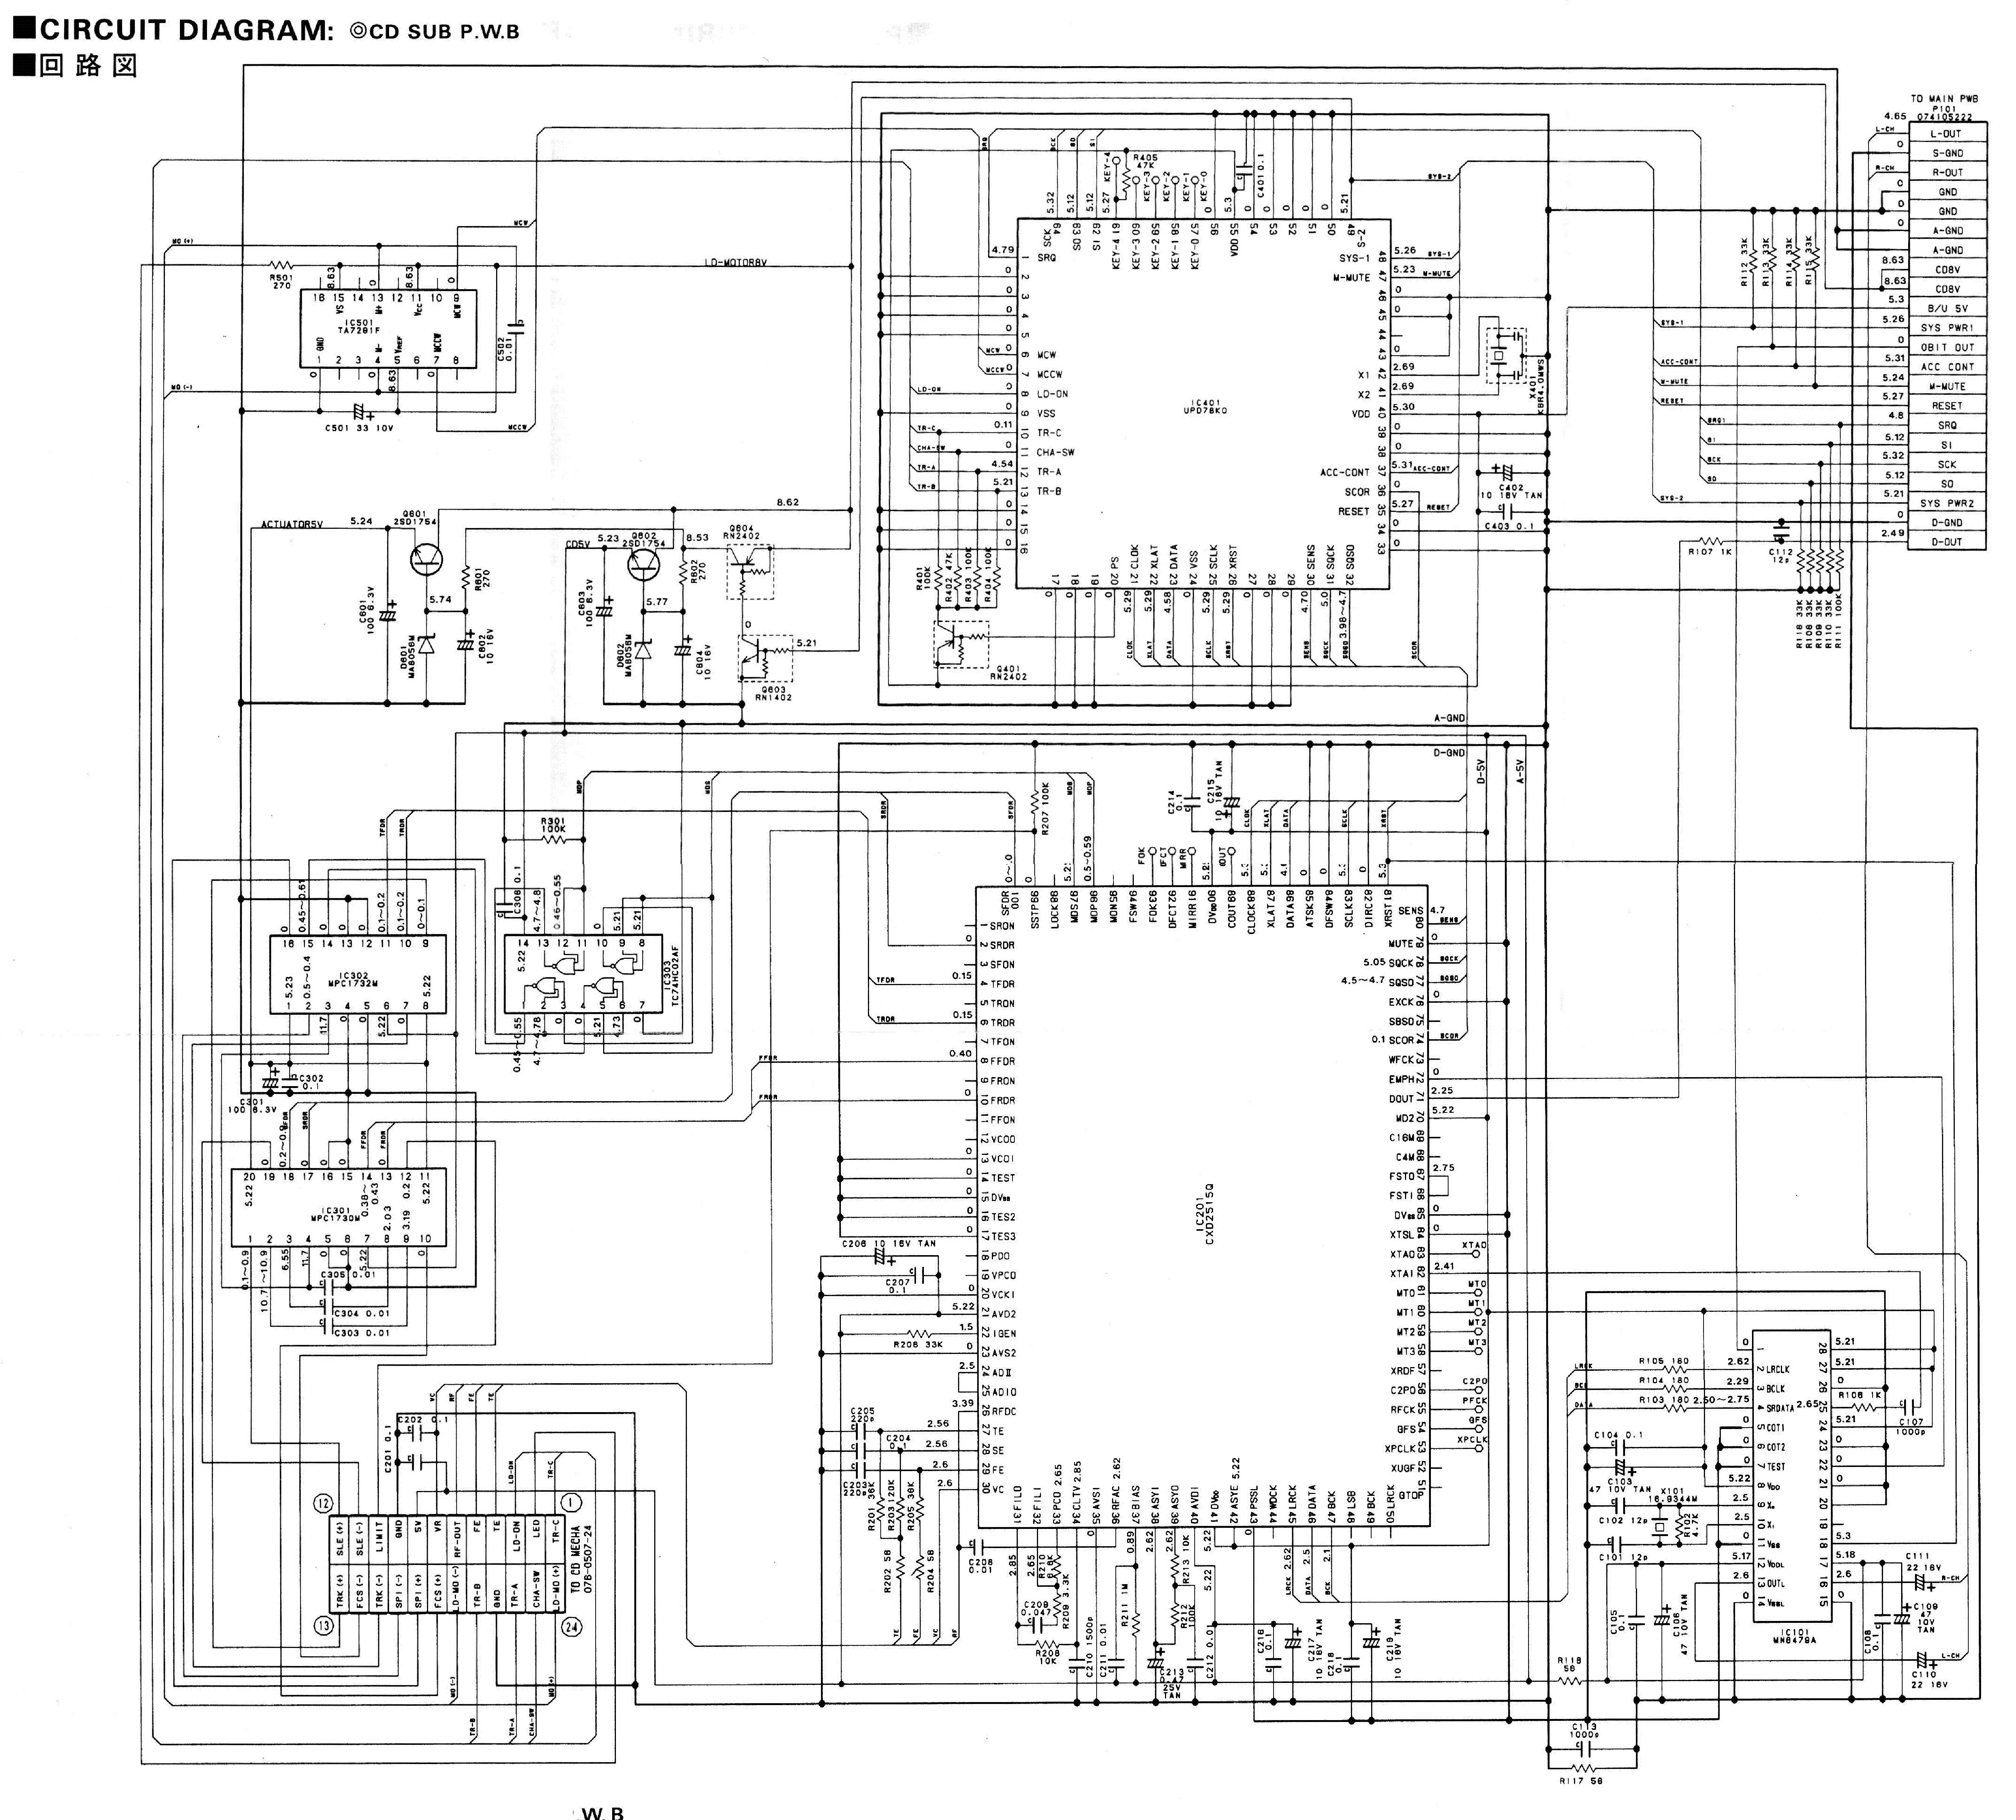 Tolle Clarion 16 Pin Schaltplan Ideen - Elektrische Schaltplan-Ideen ...